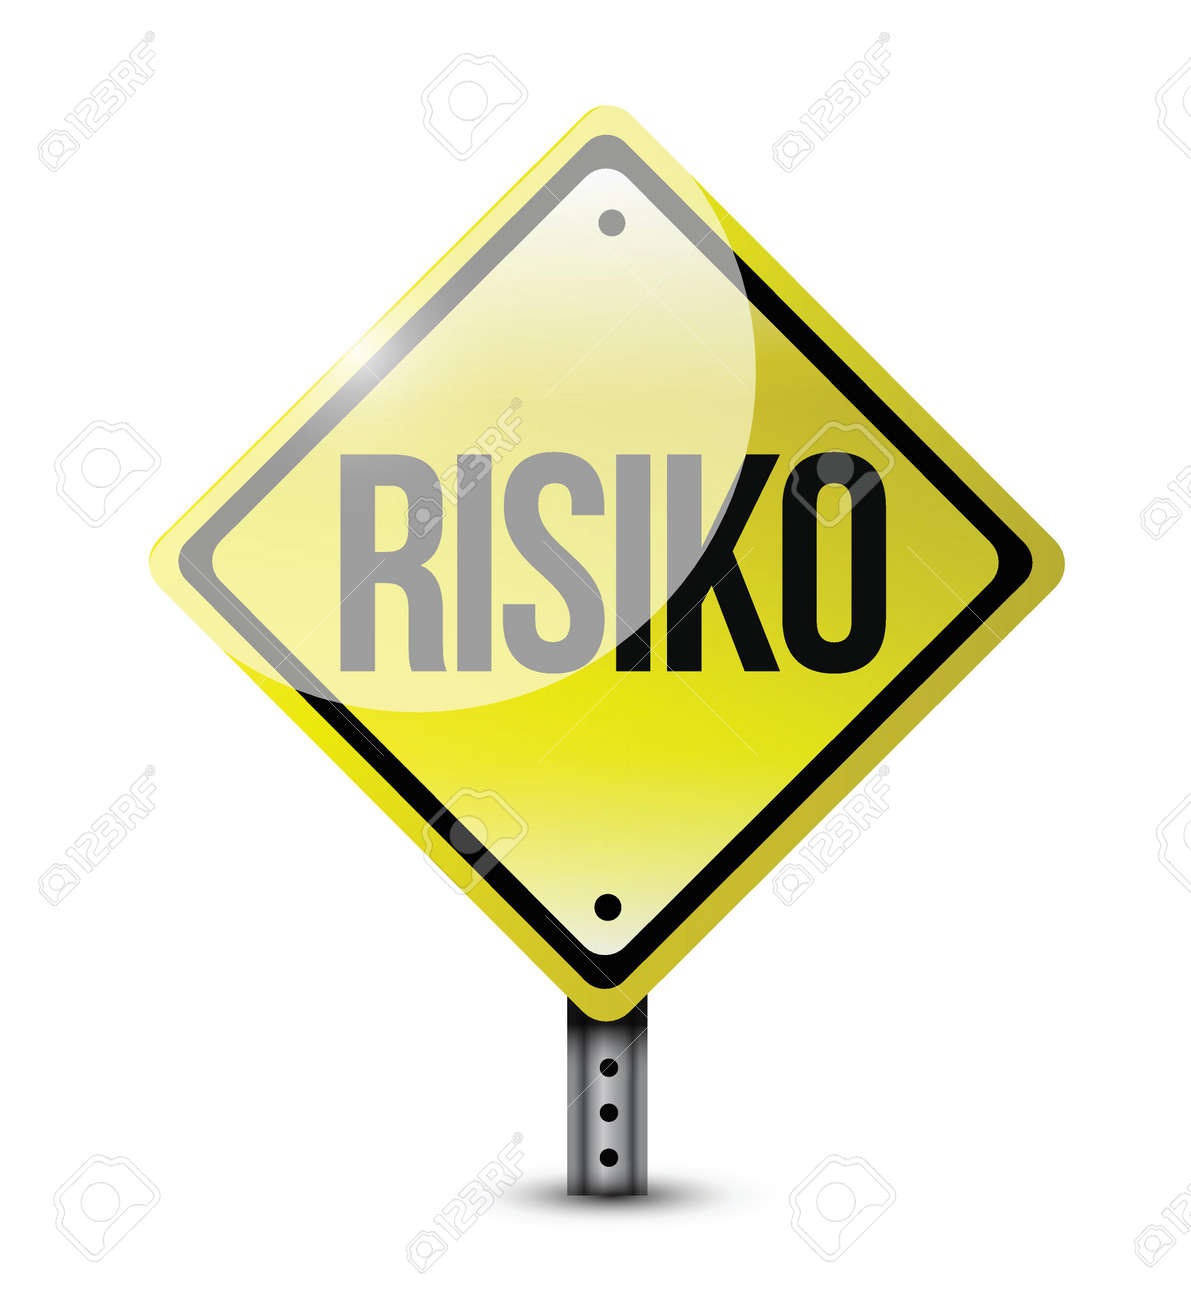 risk german road sign illustration design over white Stock Vector - 23468541